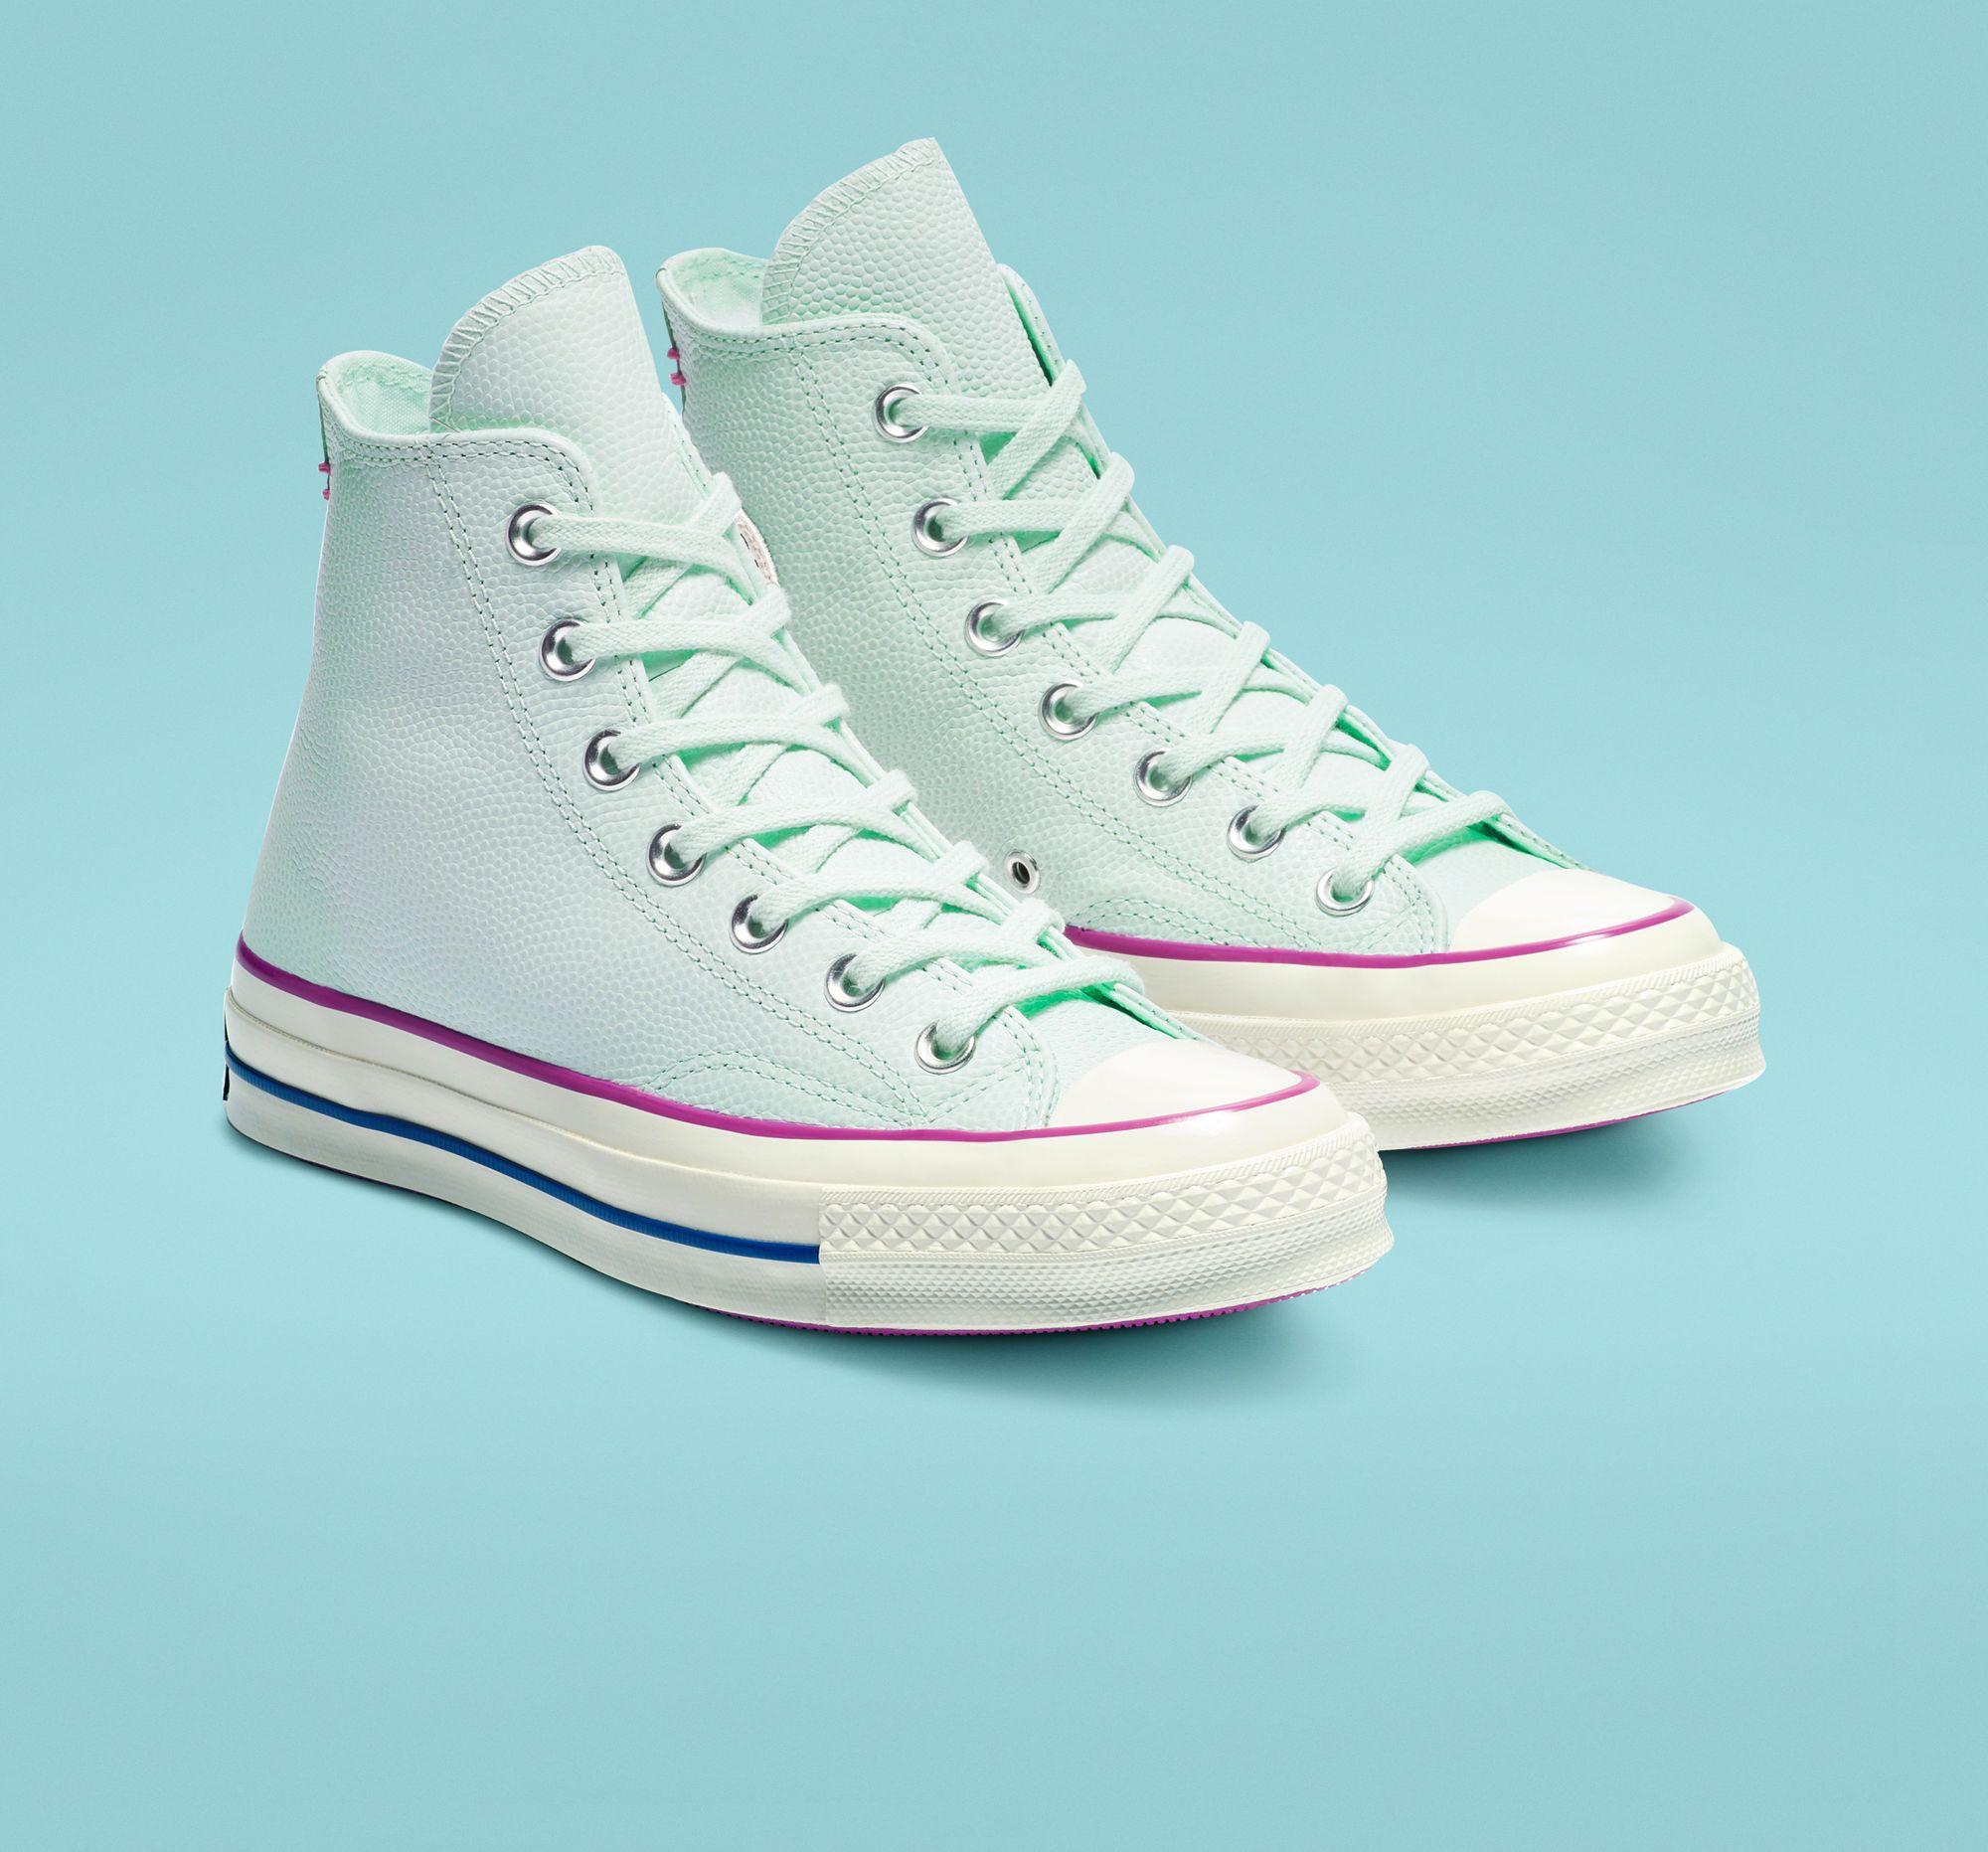 Designs Converse Chuck 70 Pastel High Schuhe Herren Im Blau